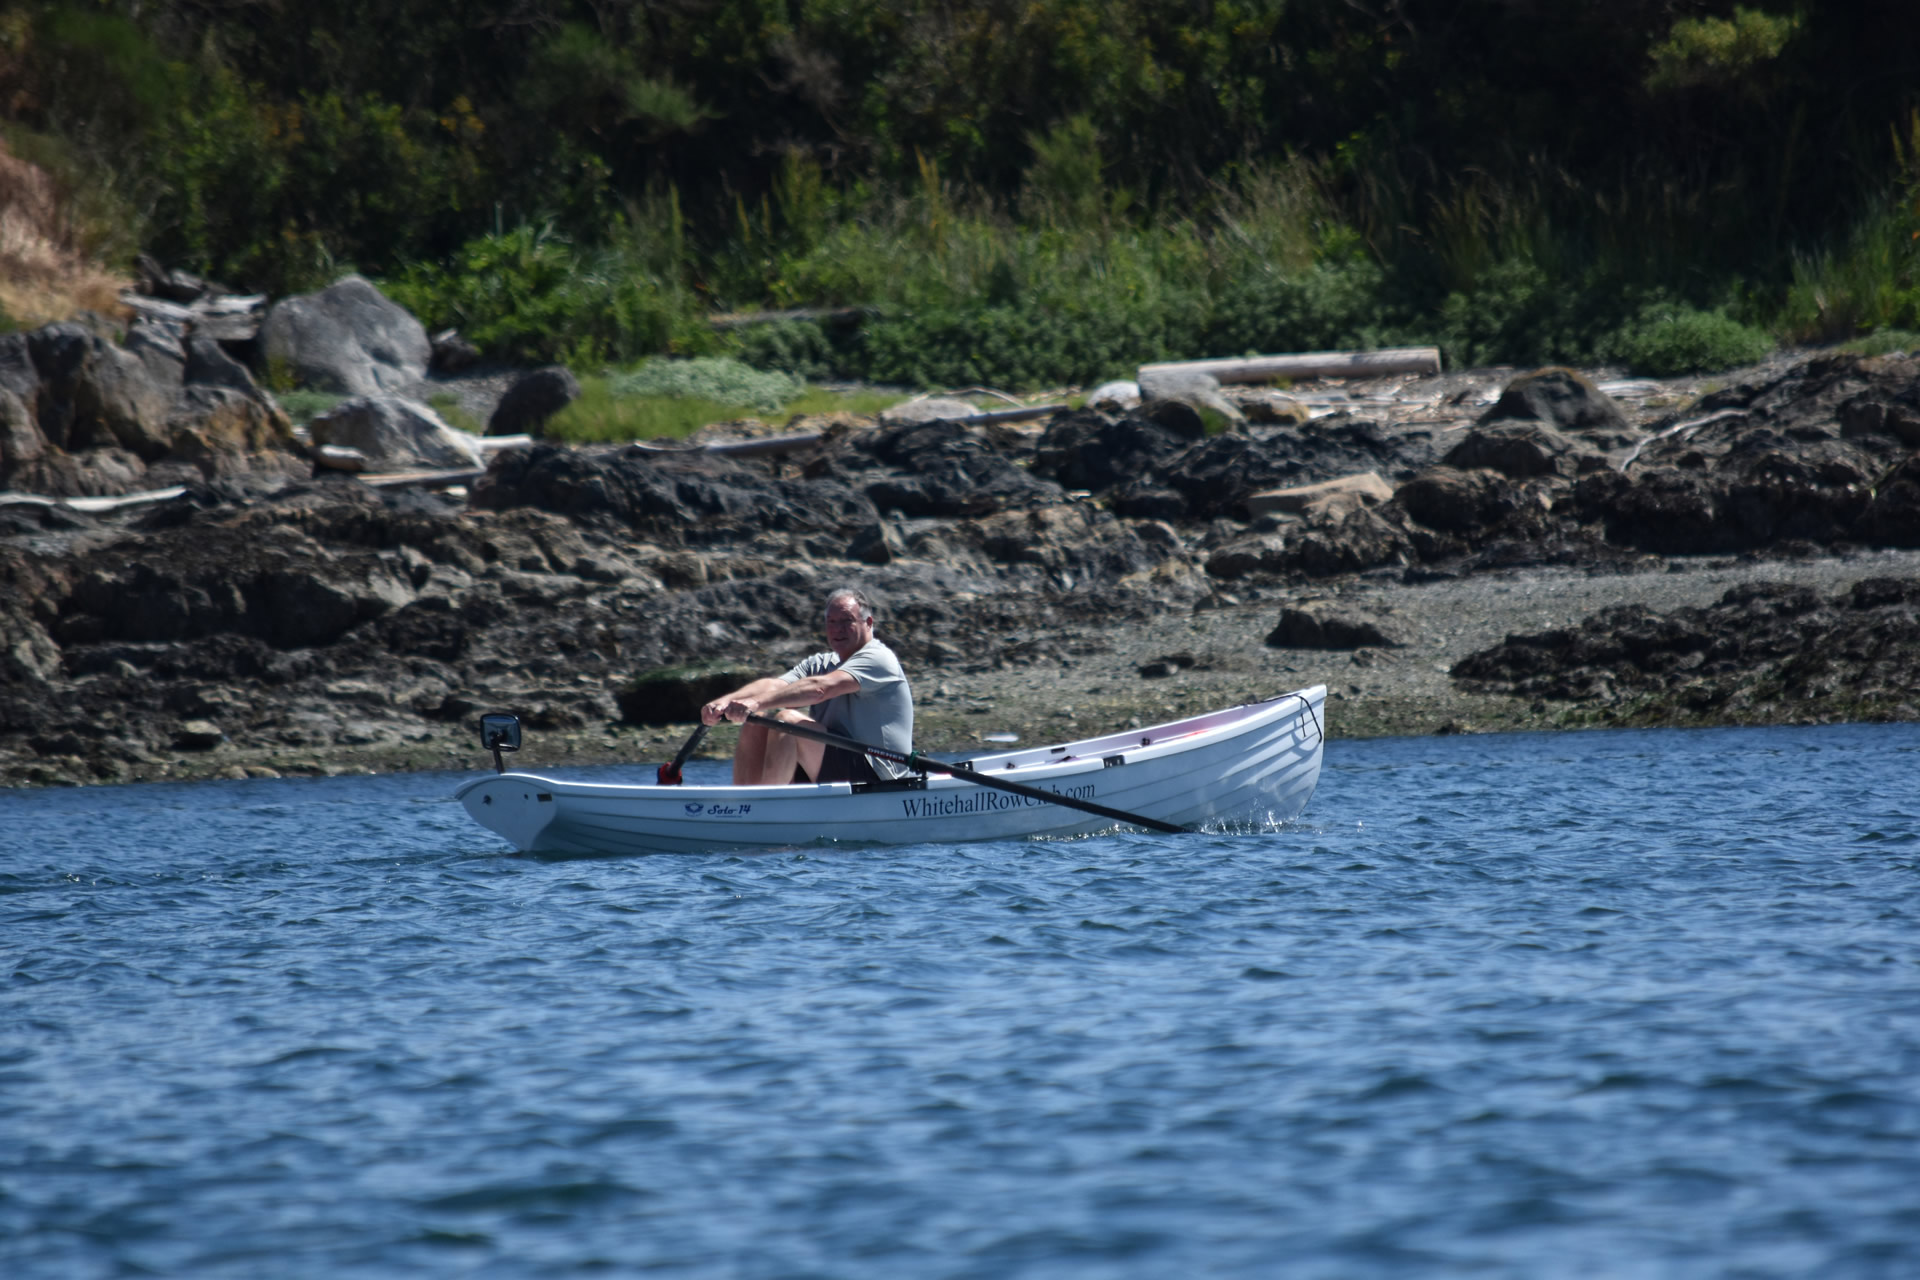 Whitehall-Spirit-Solo-14-row-boat-owner-Philip-Hulme